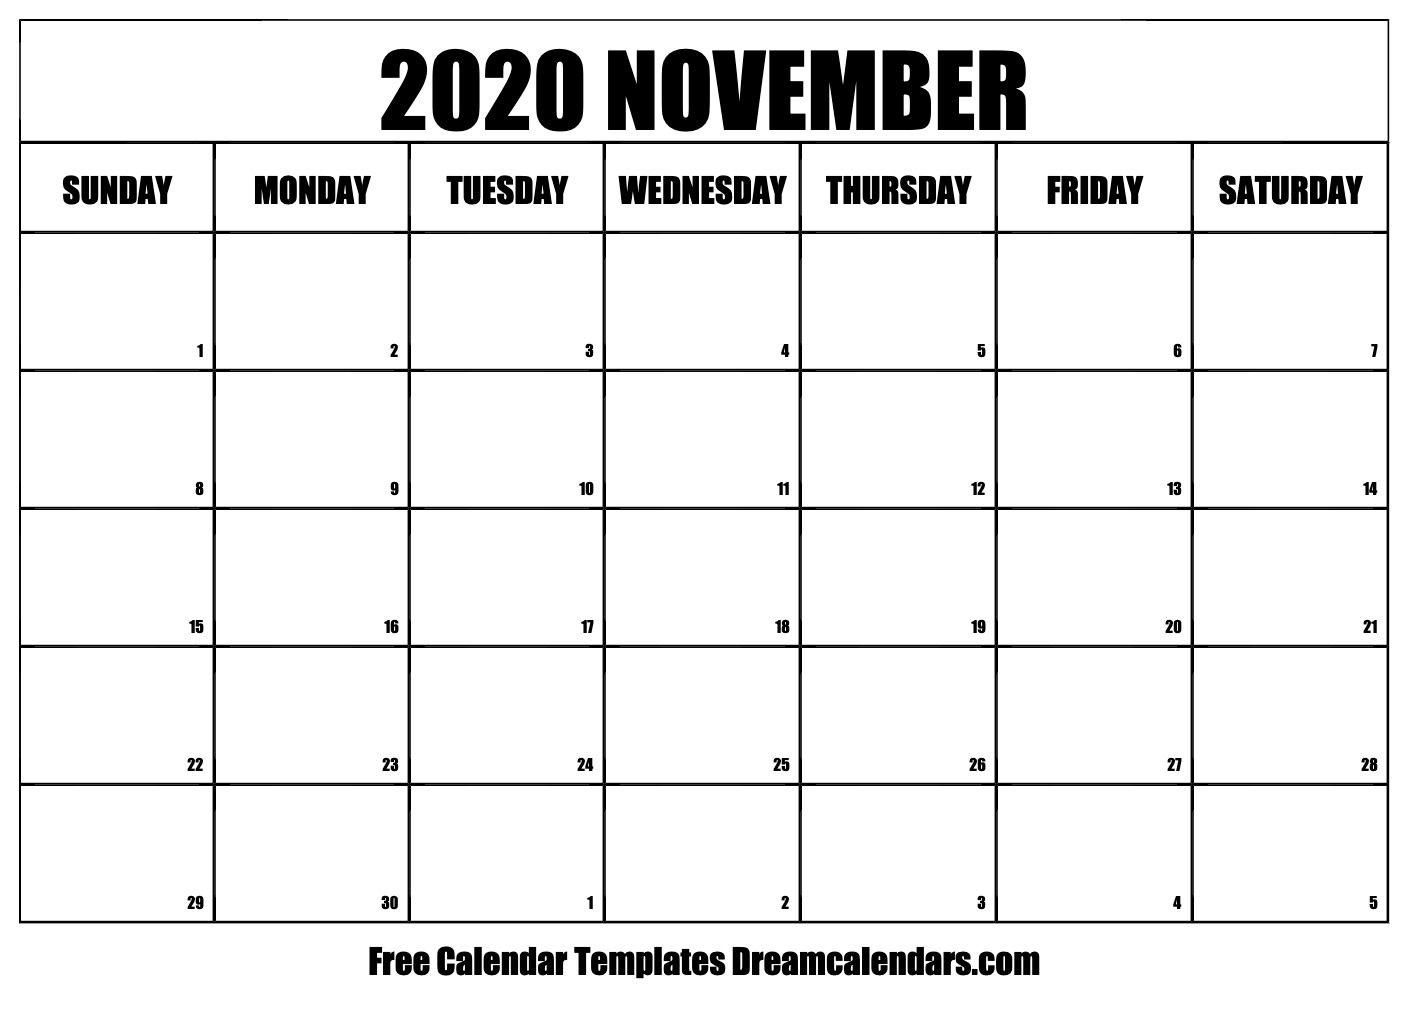 November 2020 Calendar   Free Calendar Template, Calendar Blank Calendar Page No Datea